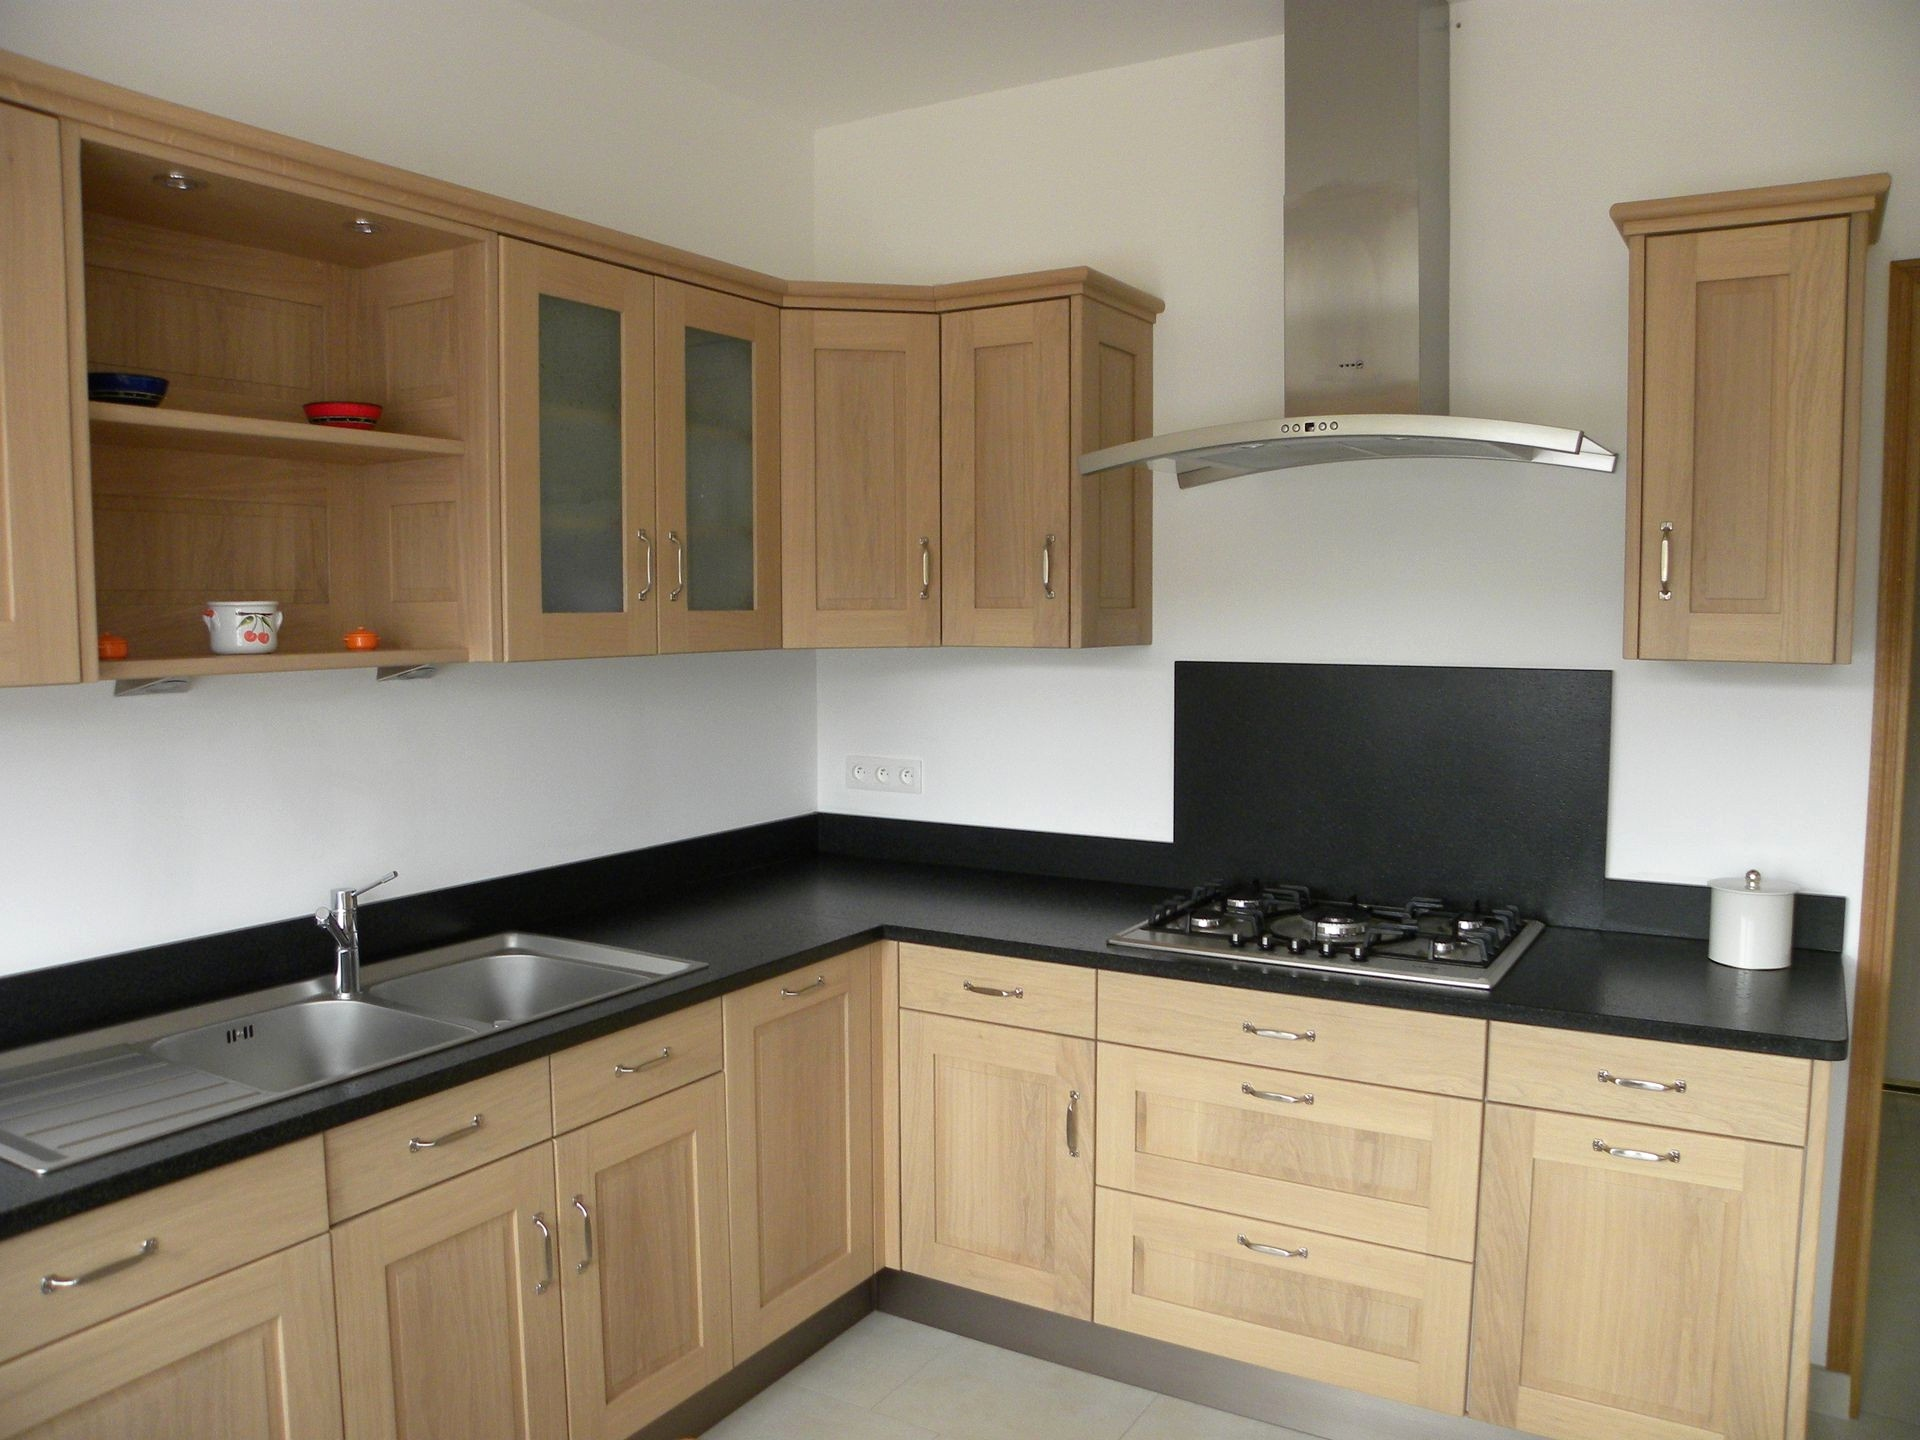 idee renovation cuisine chene id e pour cuisine. Black Bedroom Furniture Sets. Home Design Ideas